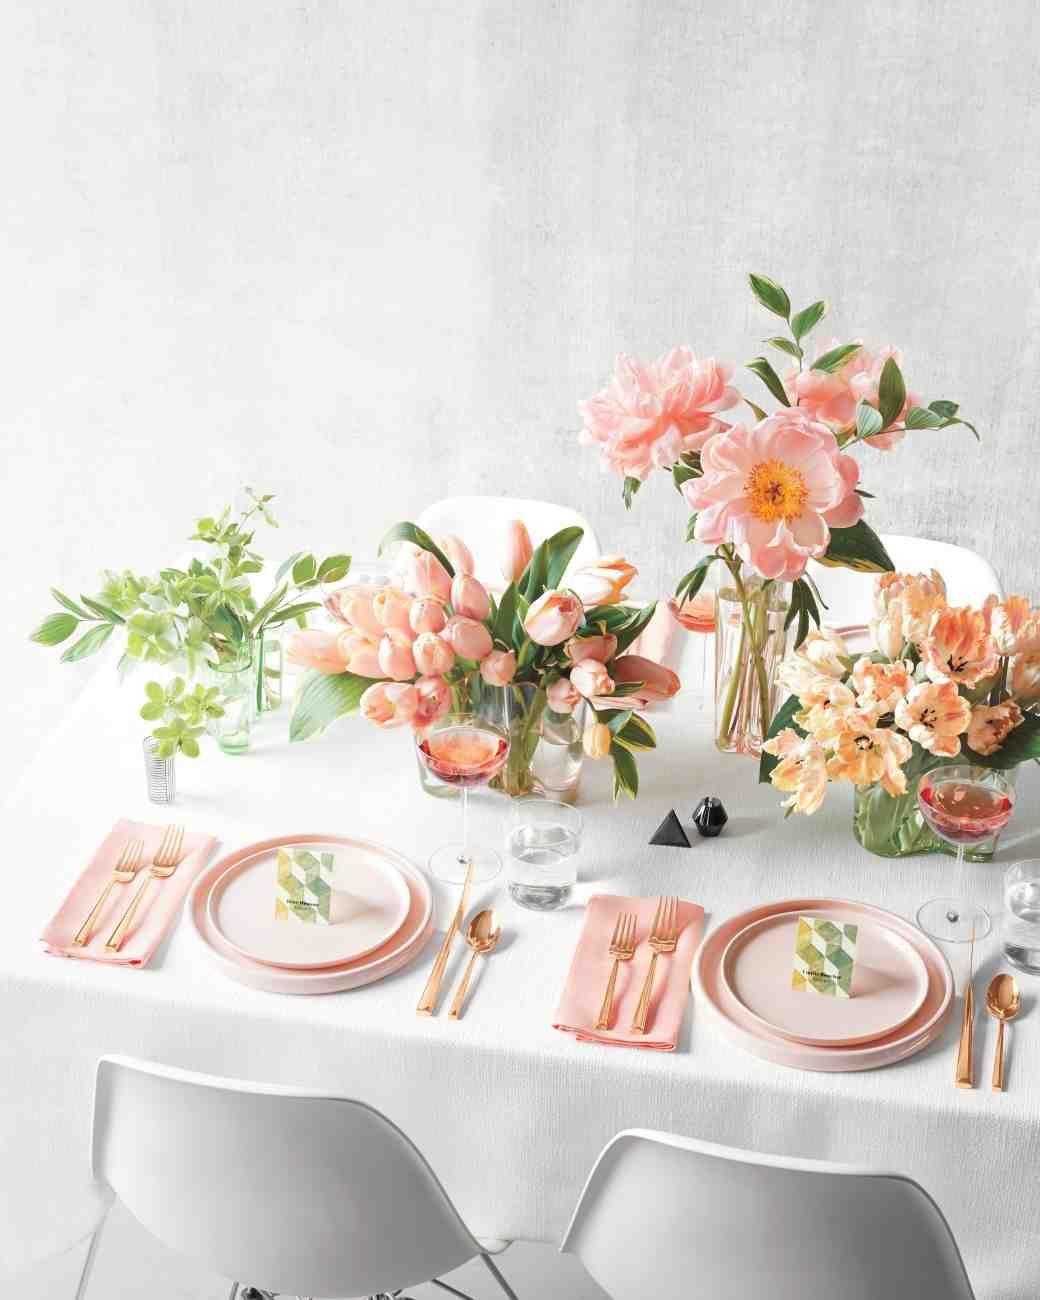 Wedding decorations home  Easter at Home Our Table u Menu Plans  blush hochzeit  blush